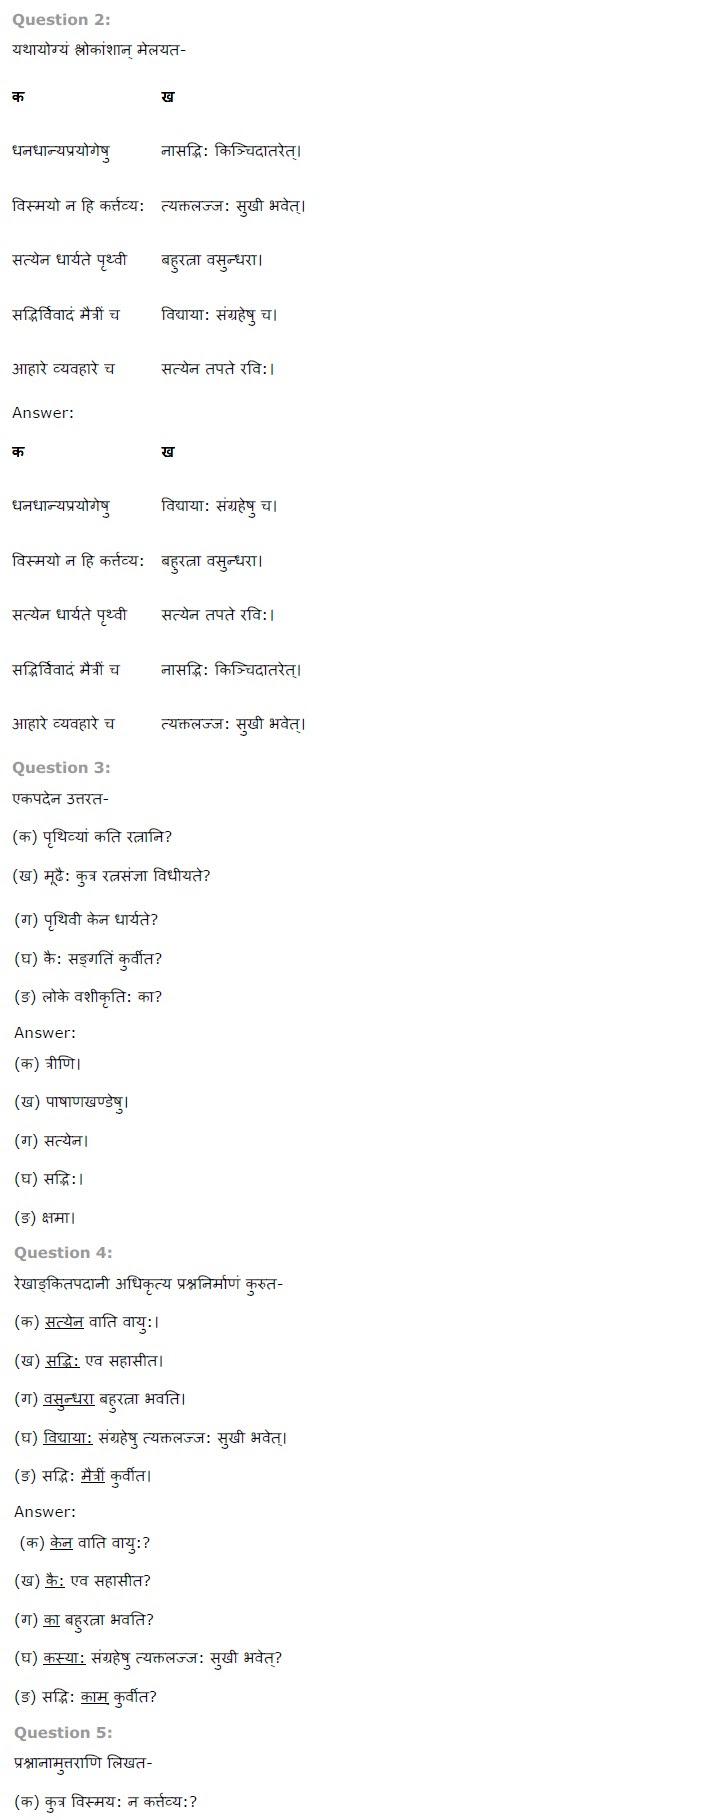 NCERT Solutions for Class 7th Sanskrit Chapter 1 - सुभाषितानी